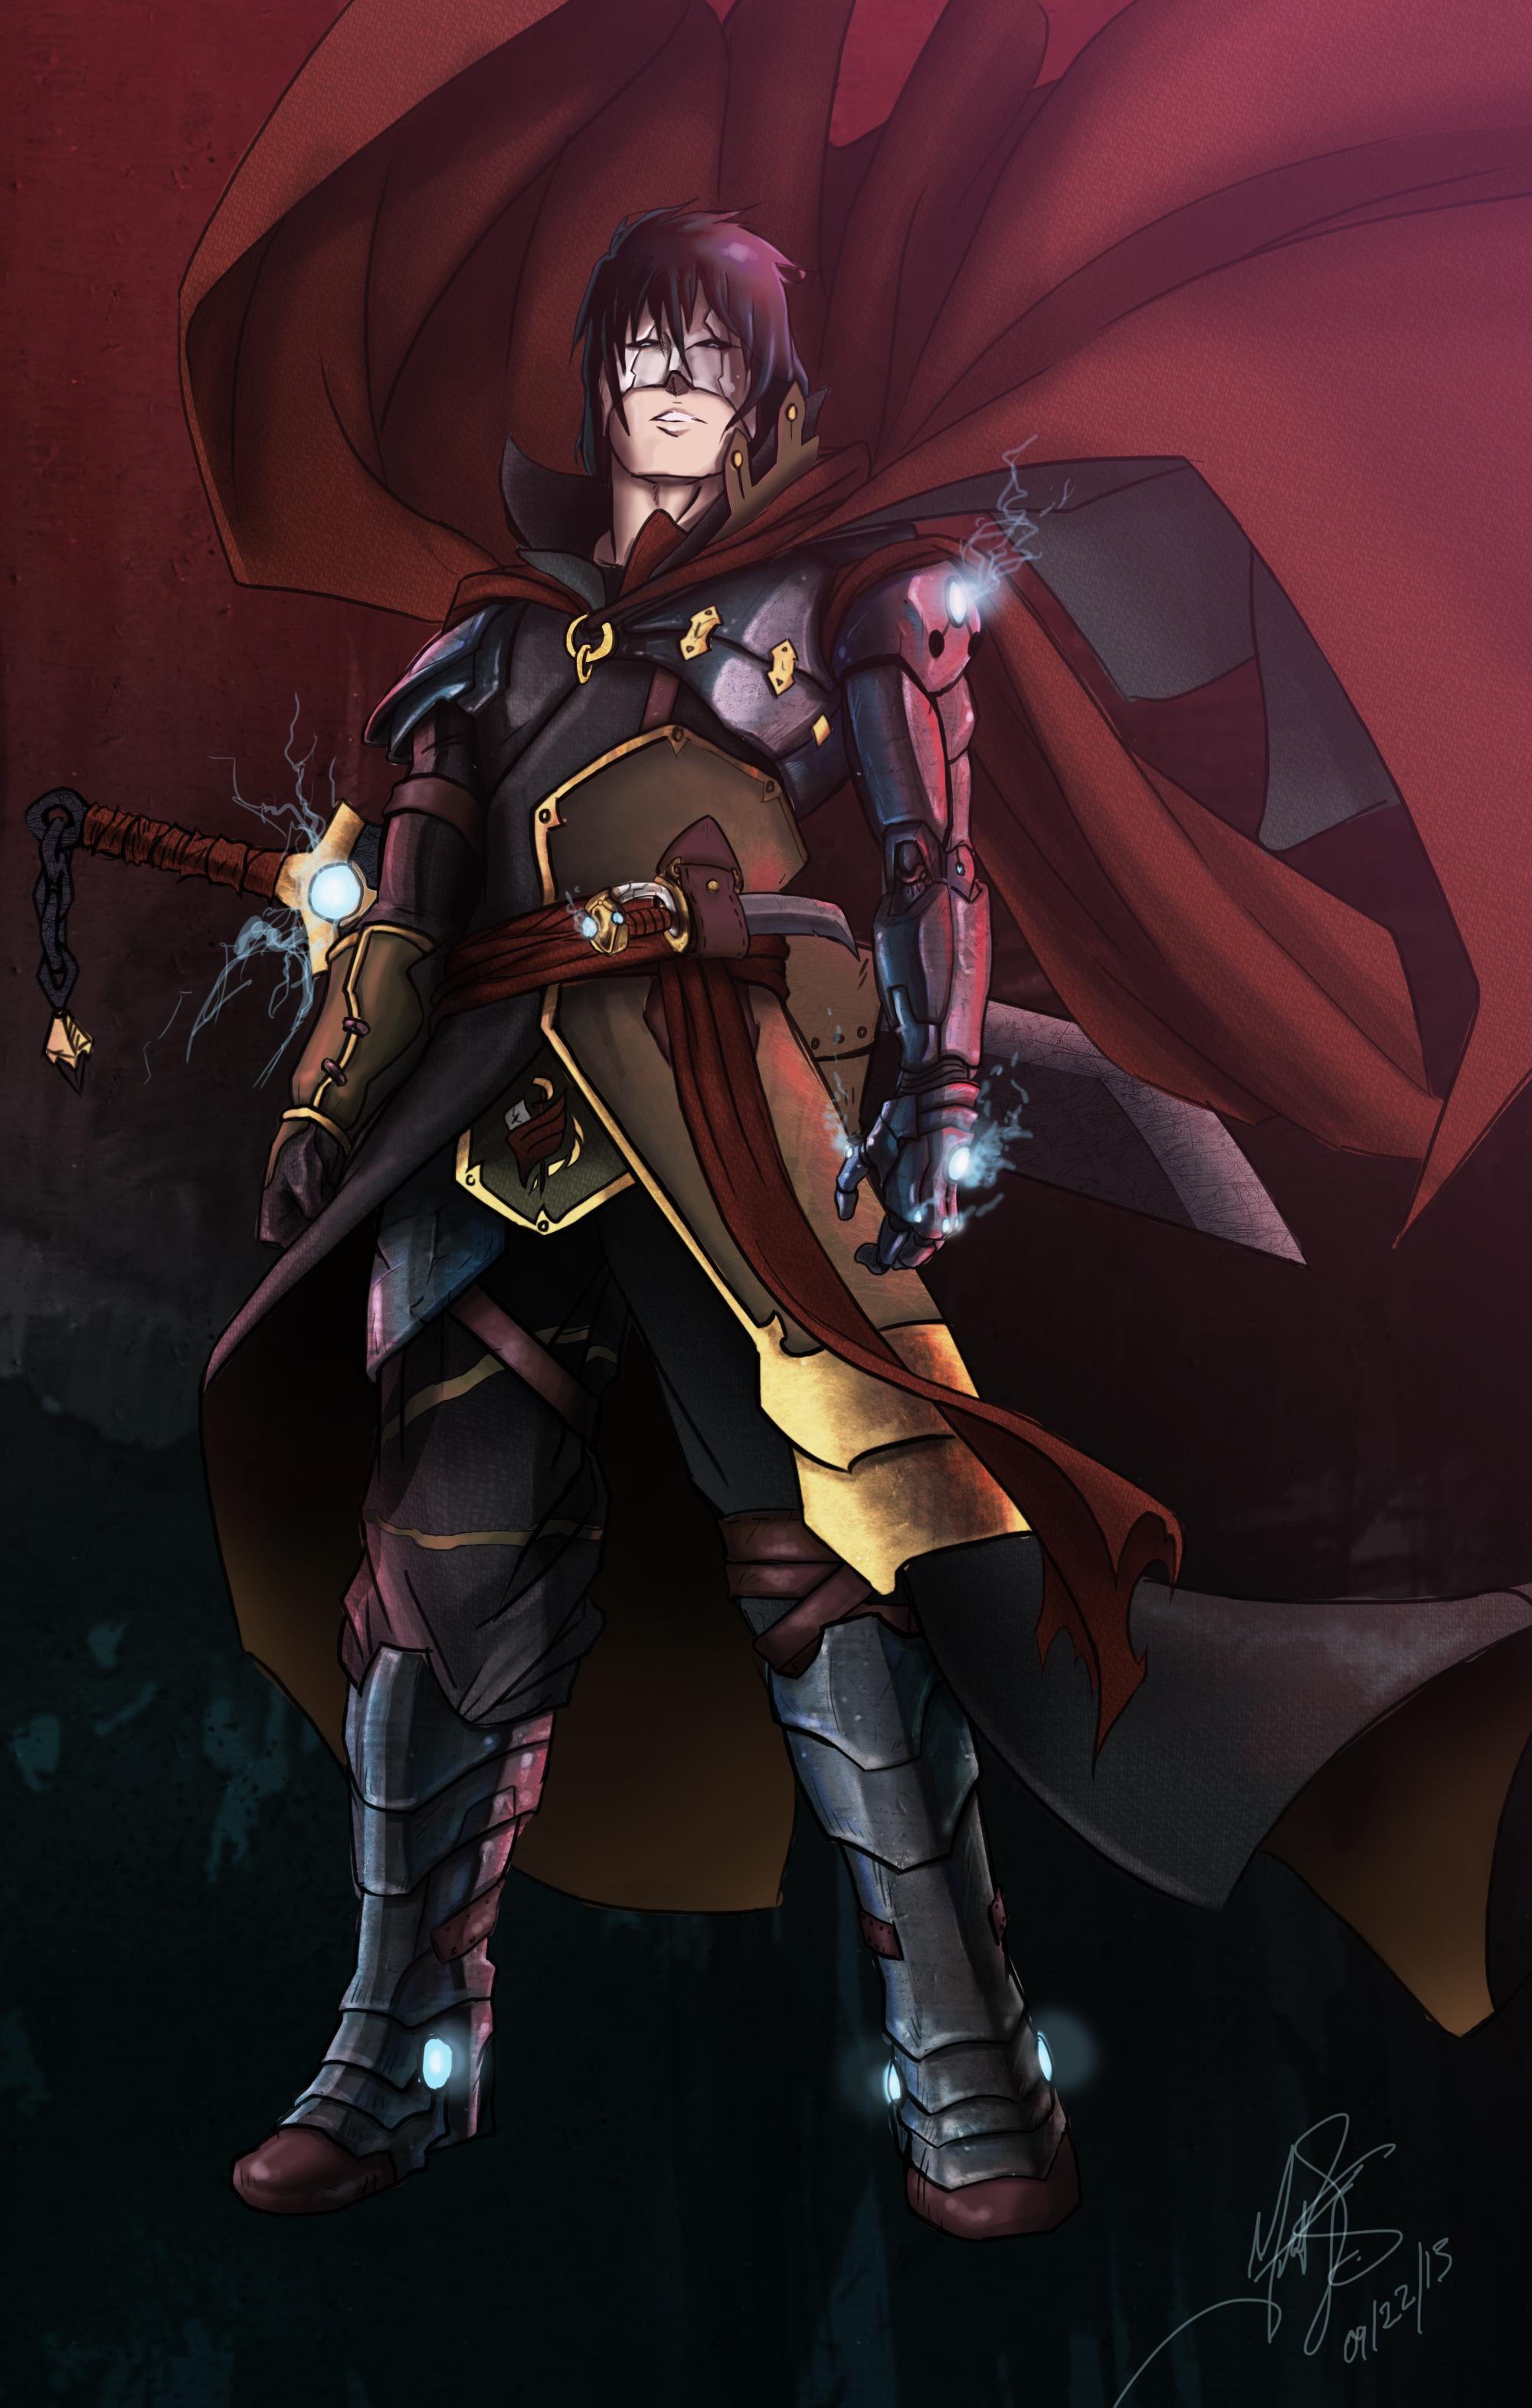 Cyborg Assassin by Faozan92 on DeviantArt